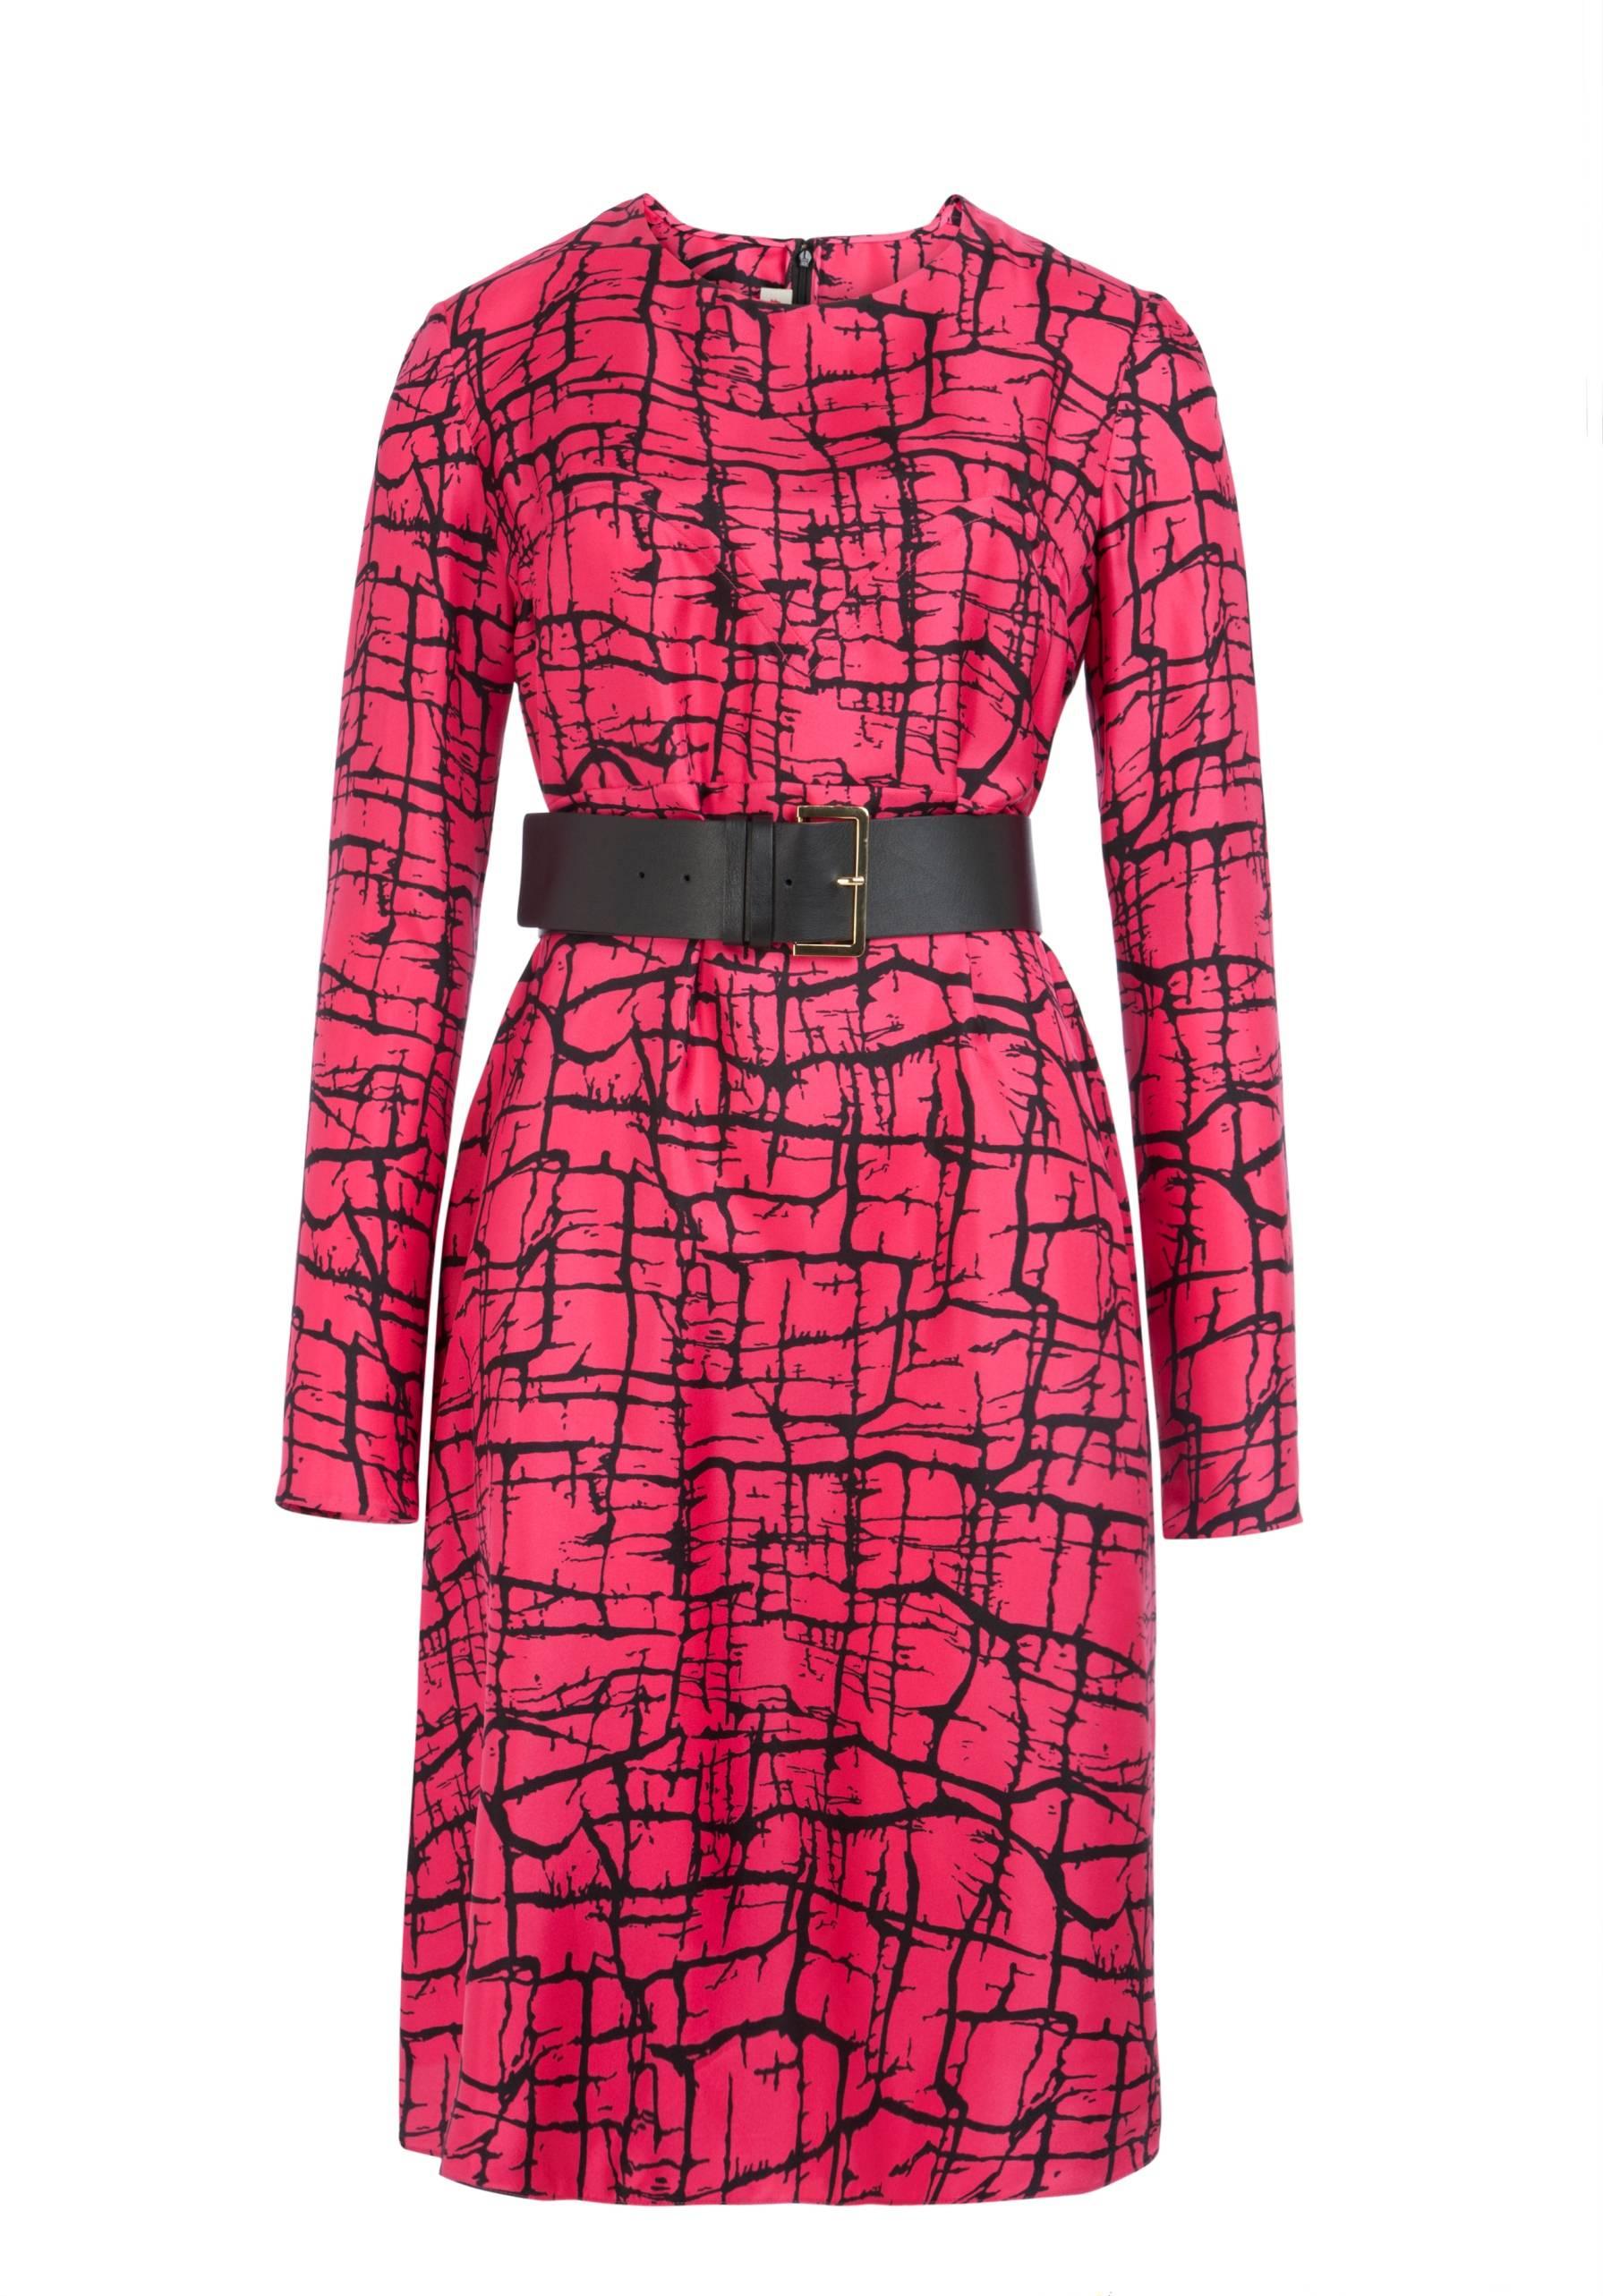 Marni – AED4650 (dress) AED1200 (belt)